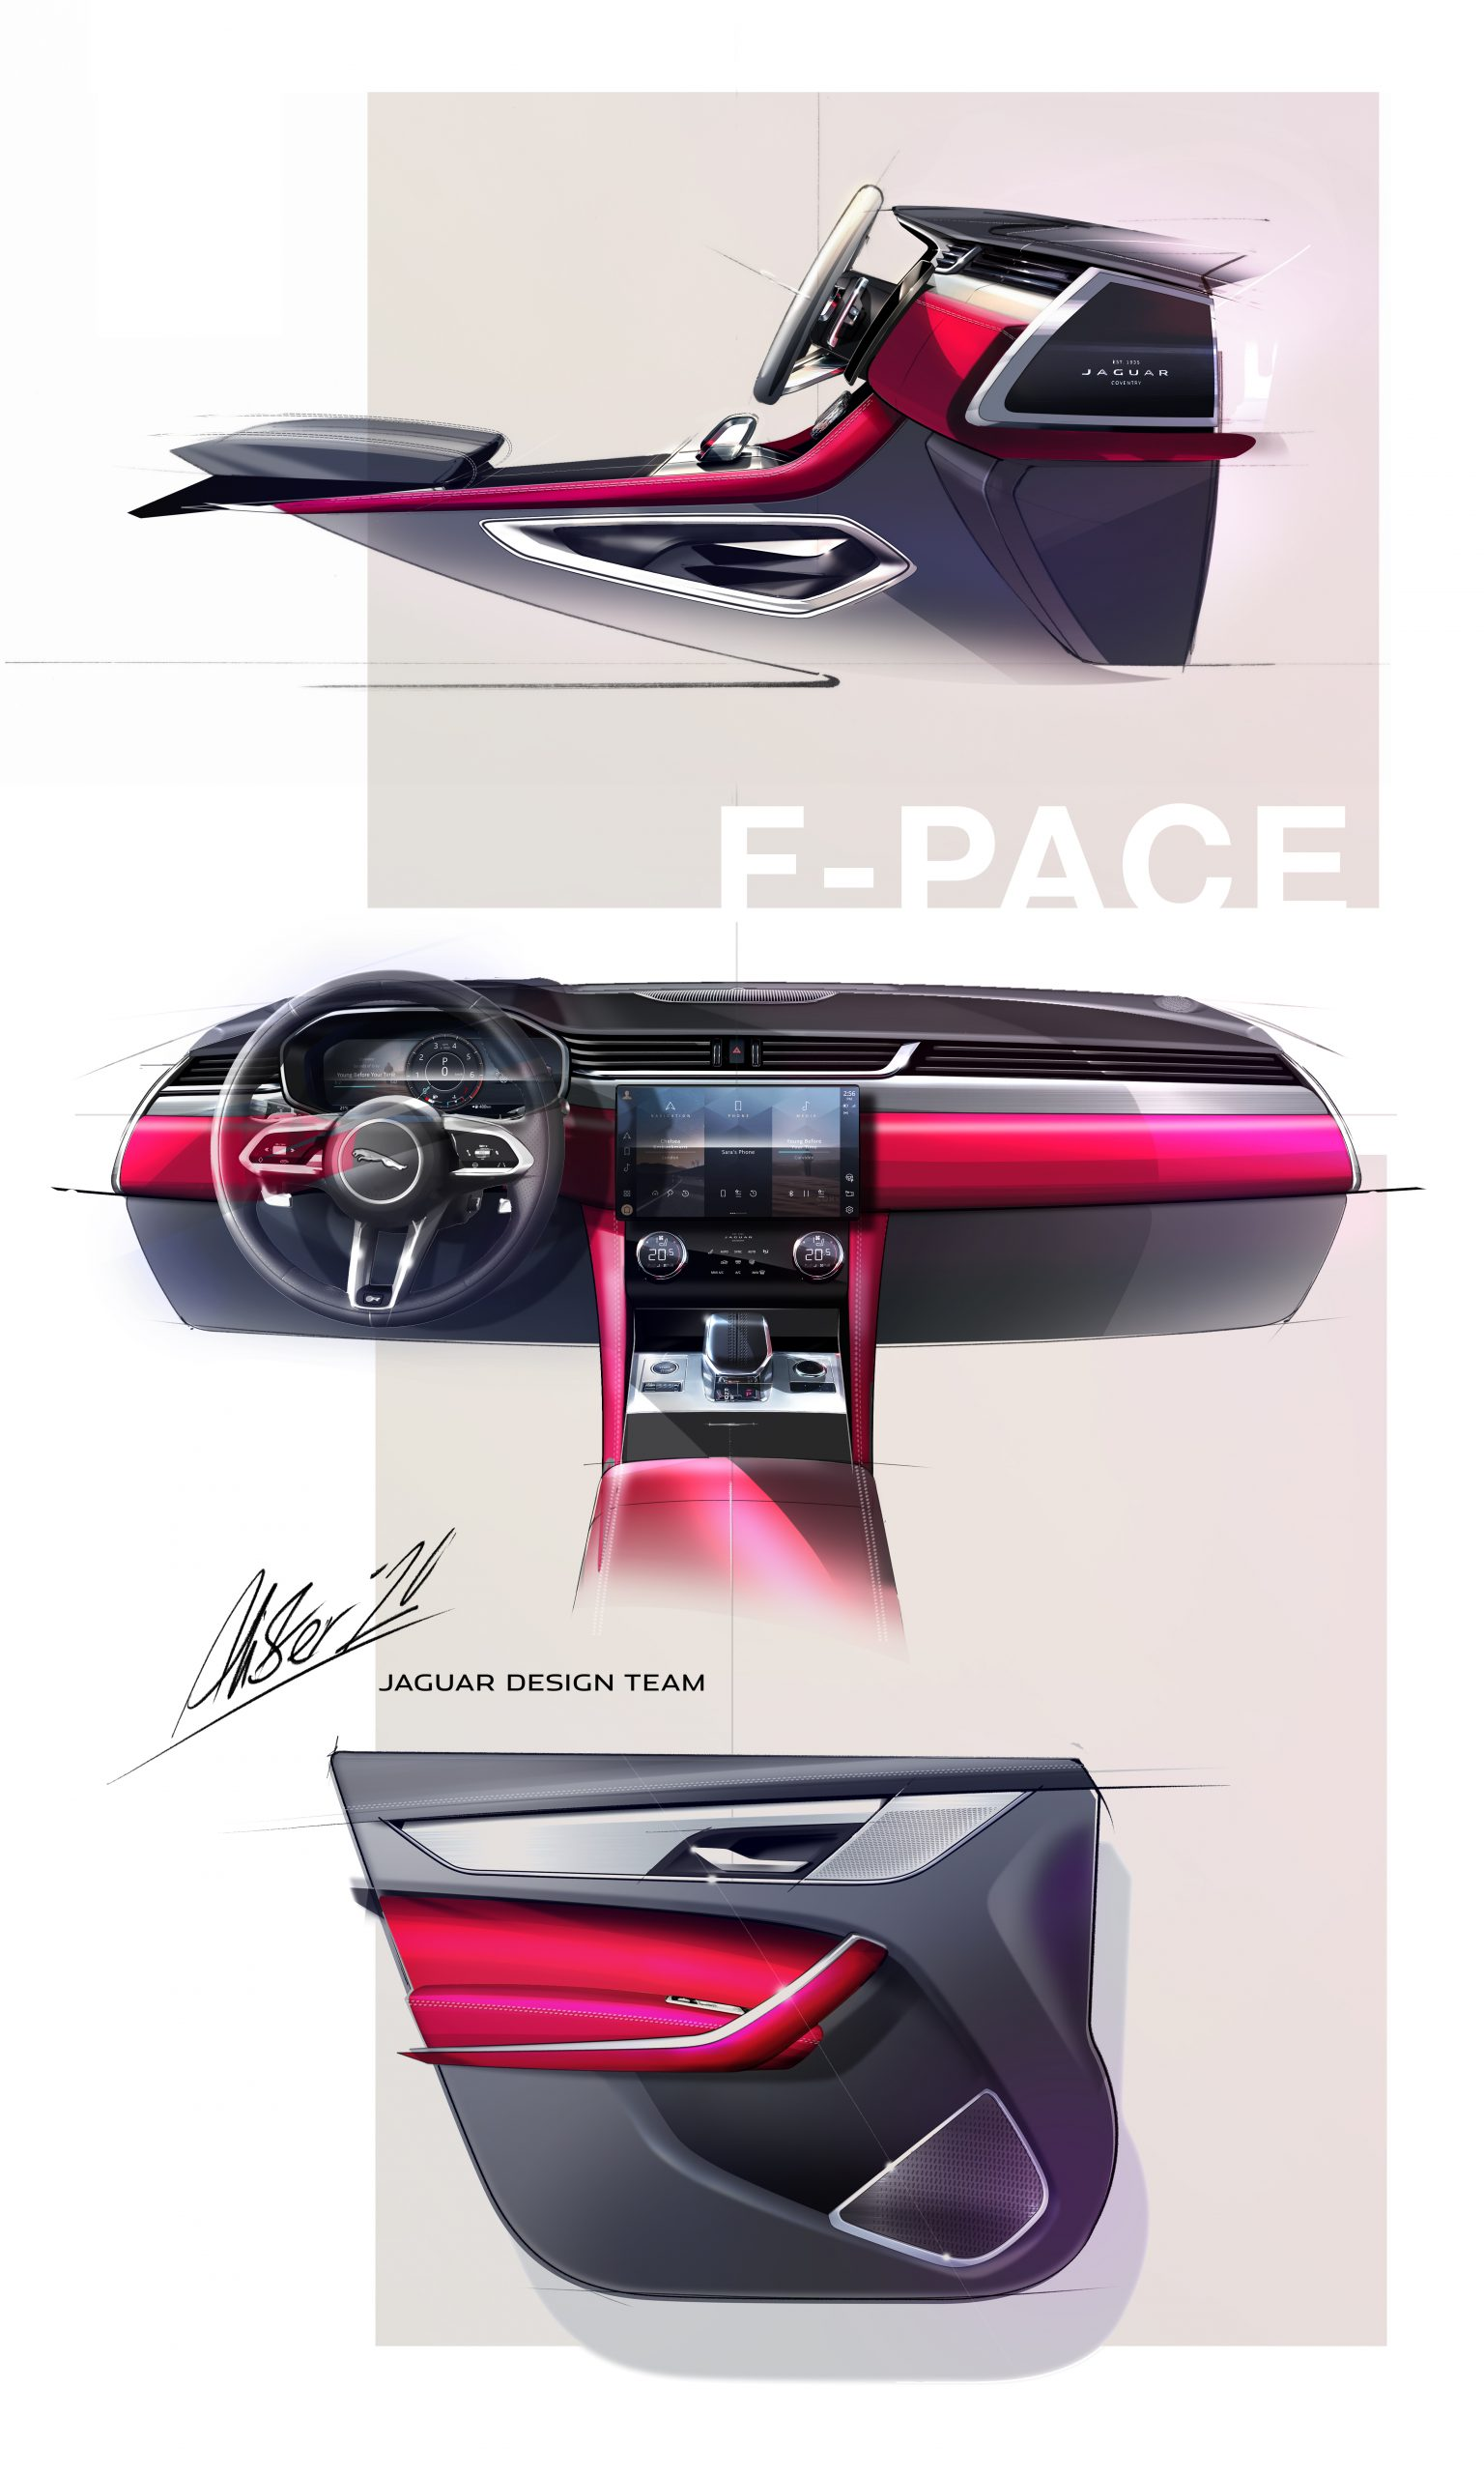 2021 Jaguar F-PACE interior design sketch